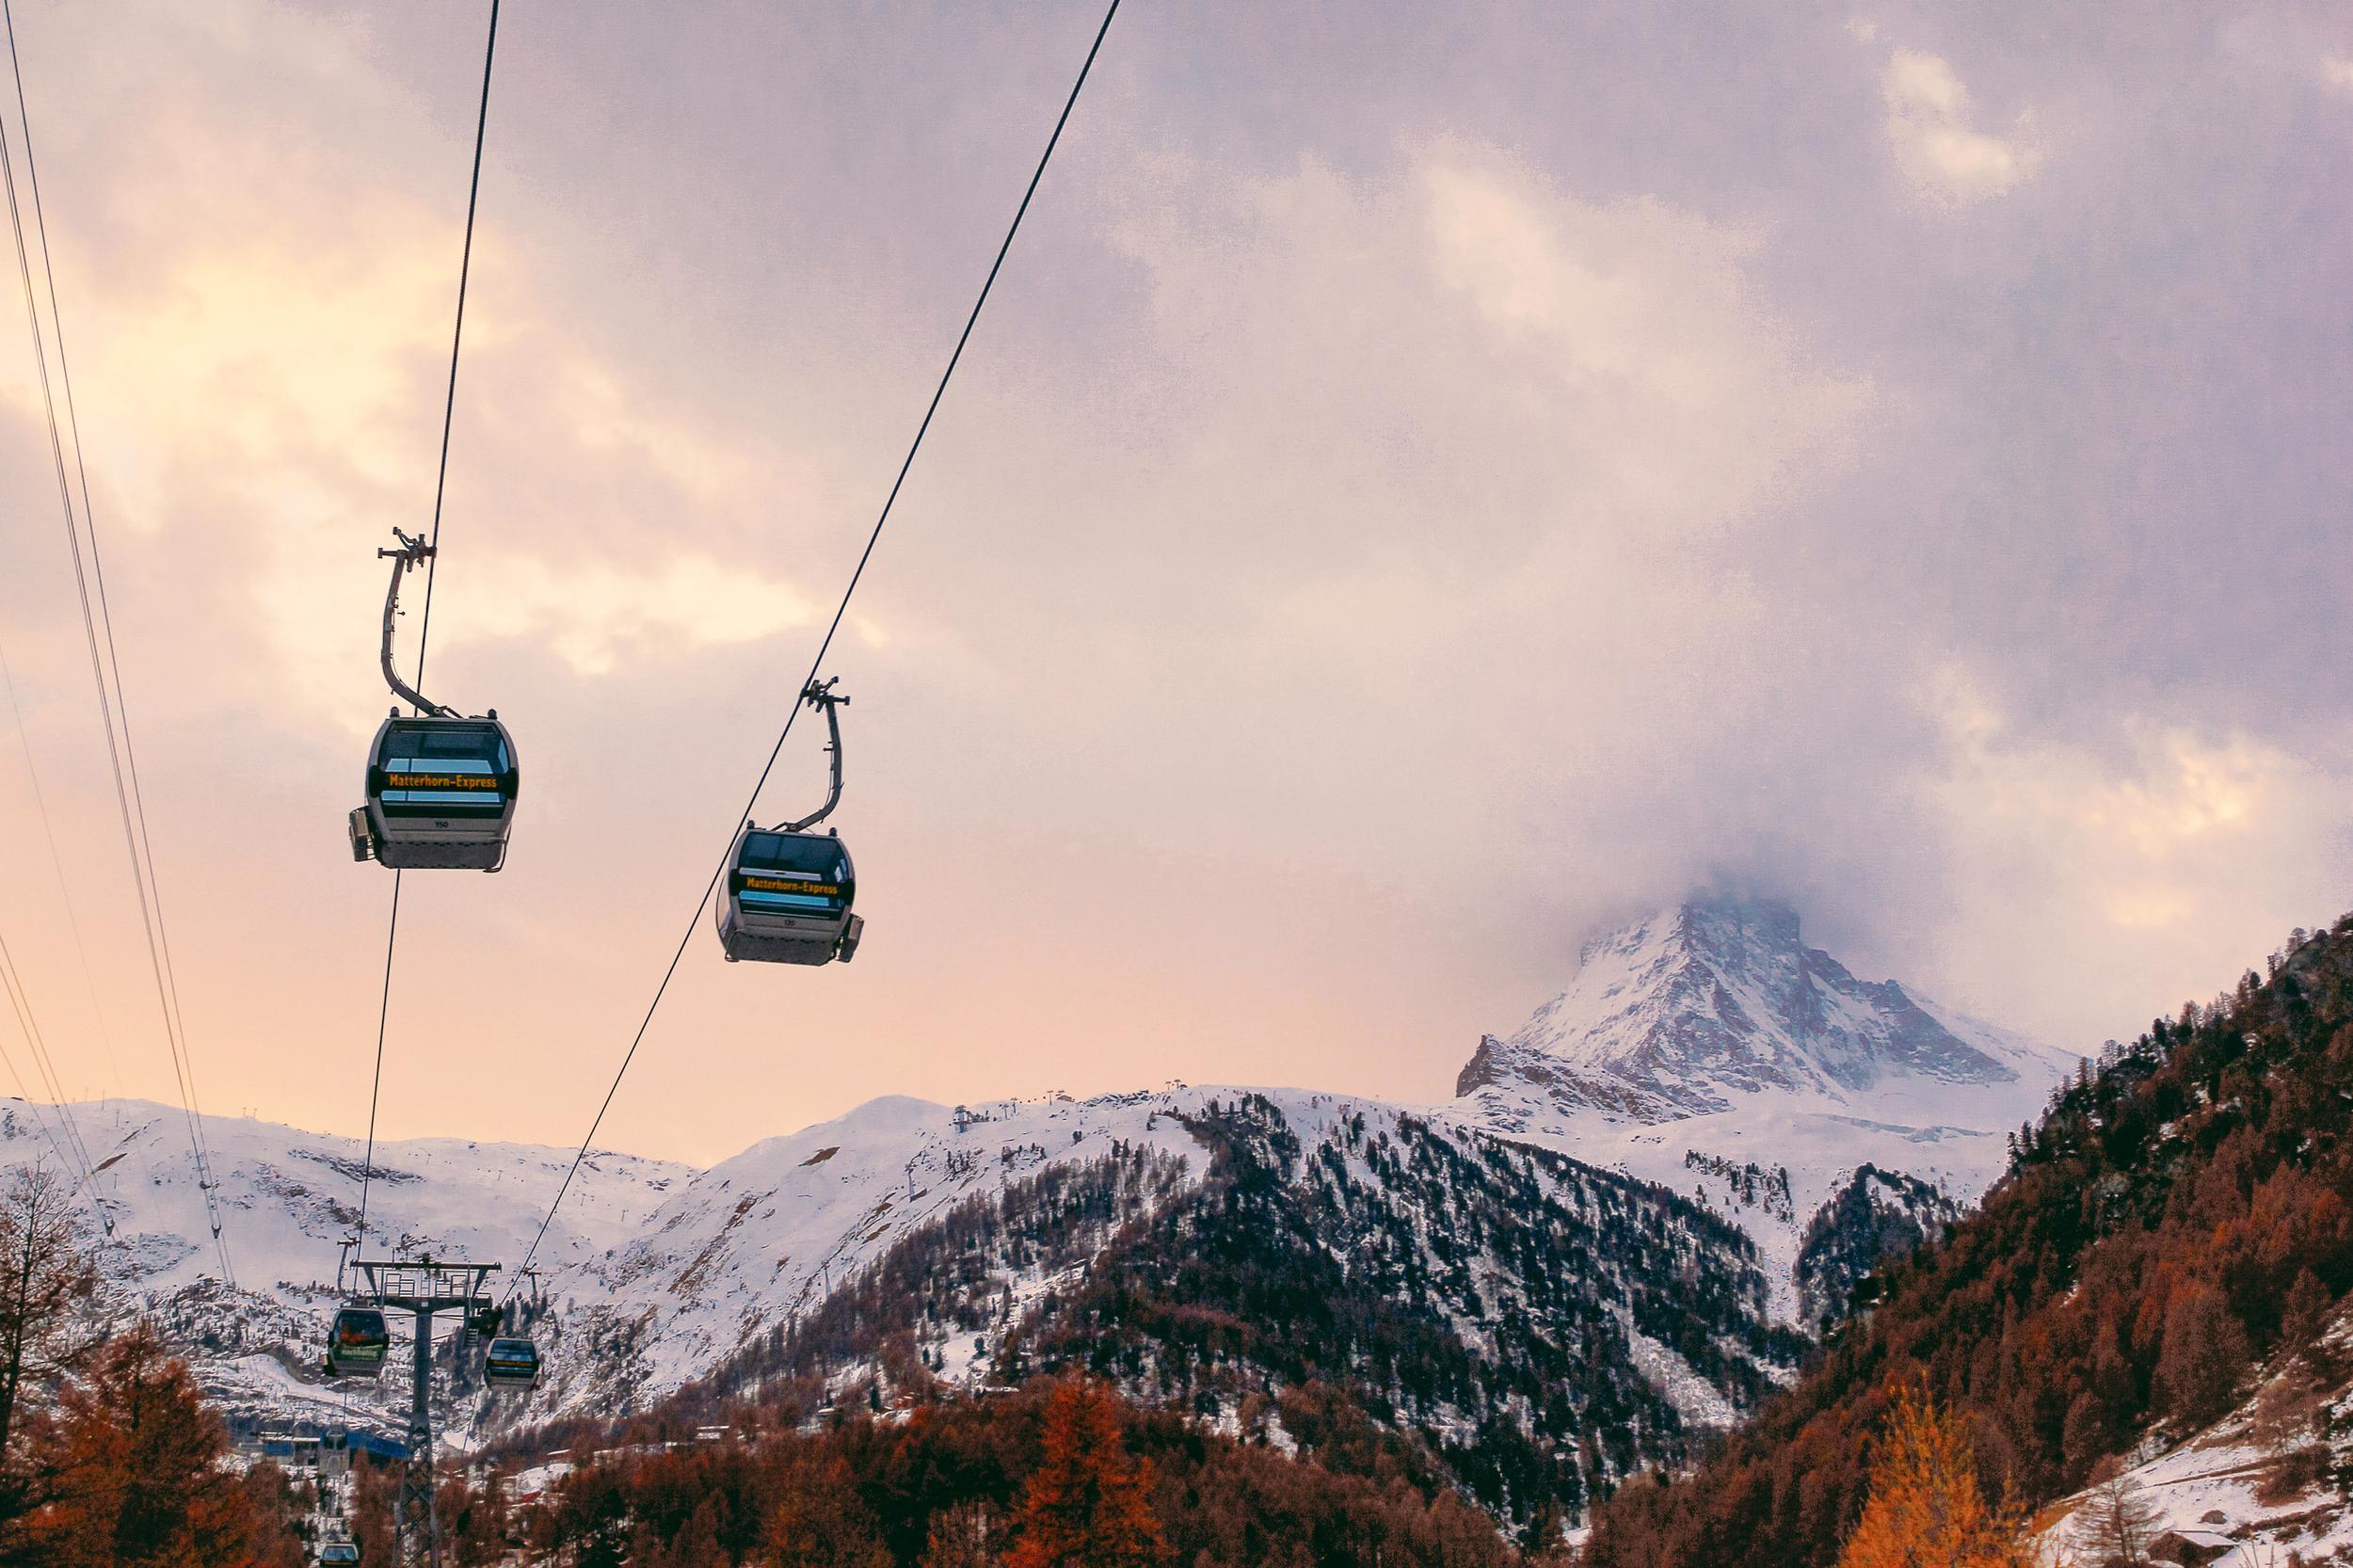 Zermatt Transportation - No Car Policy - Zermatt Travel Guide